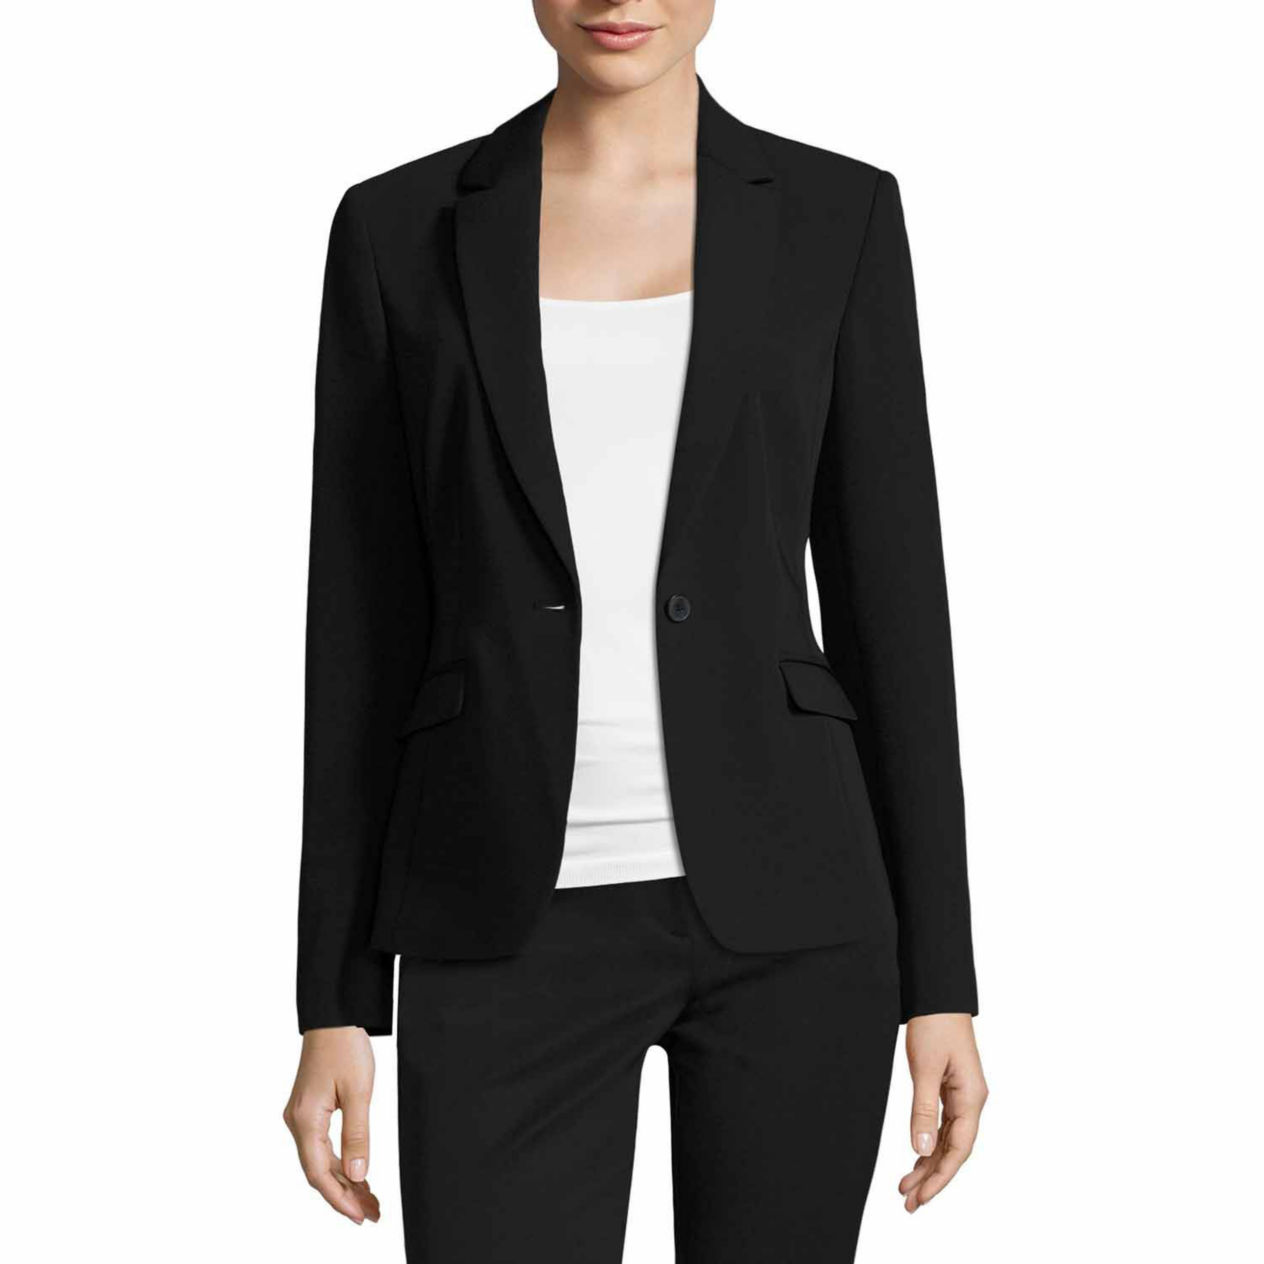 Women's Petite Black Blazer